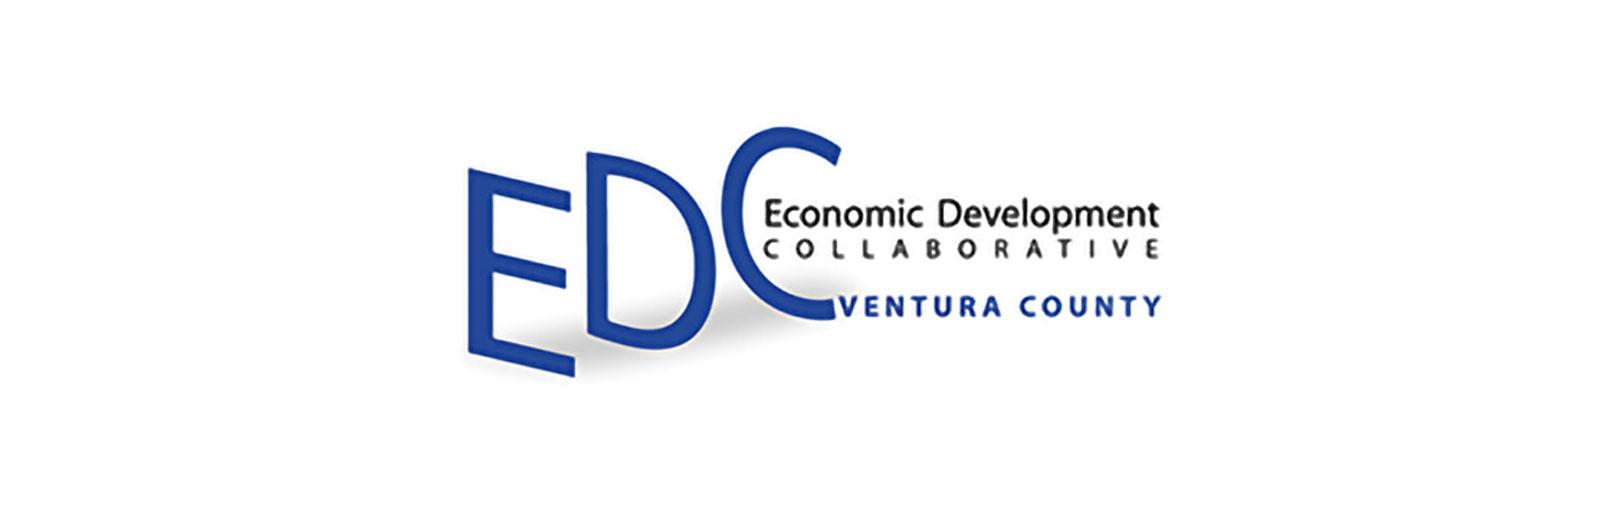 partners-logo-EDC-Ventura-County